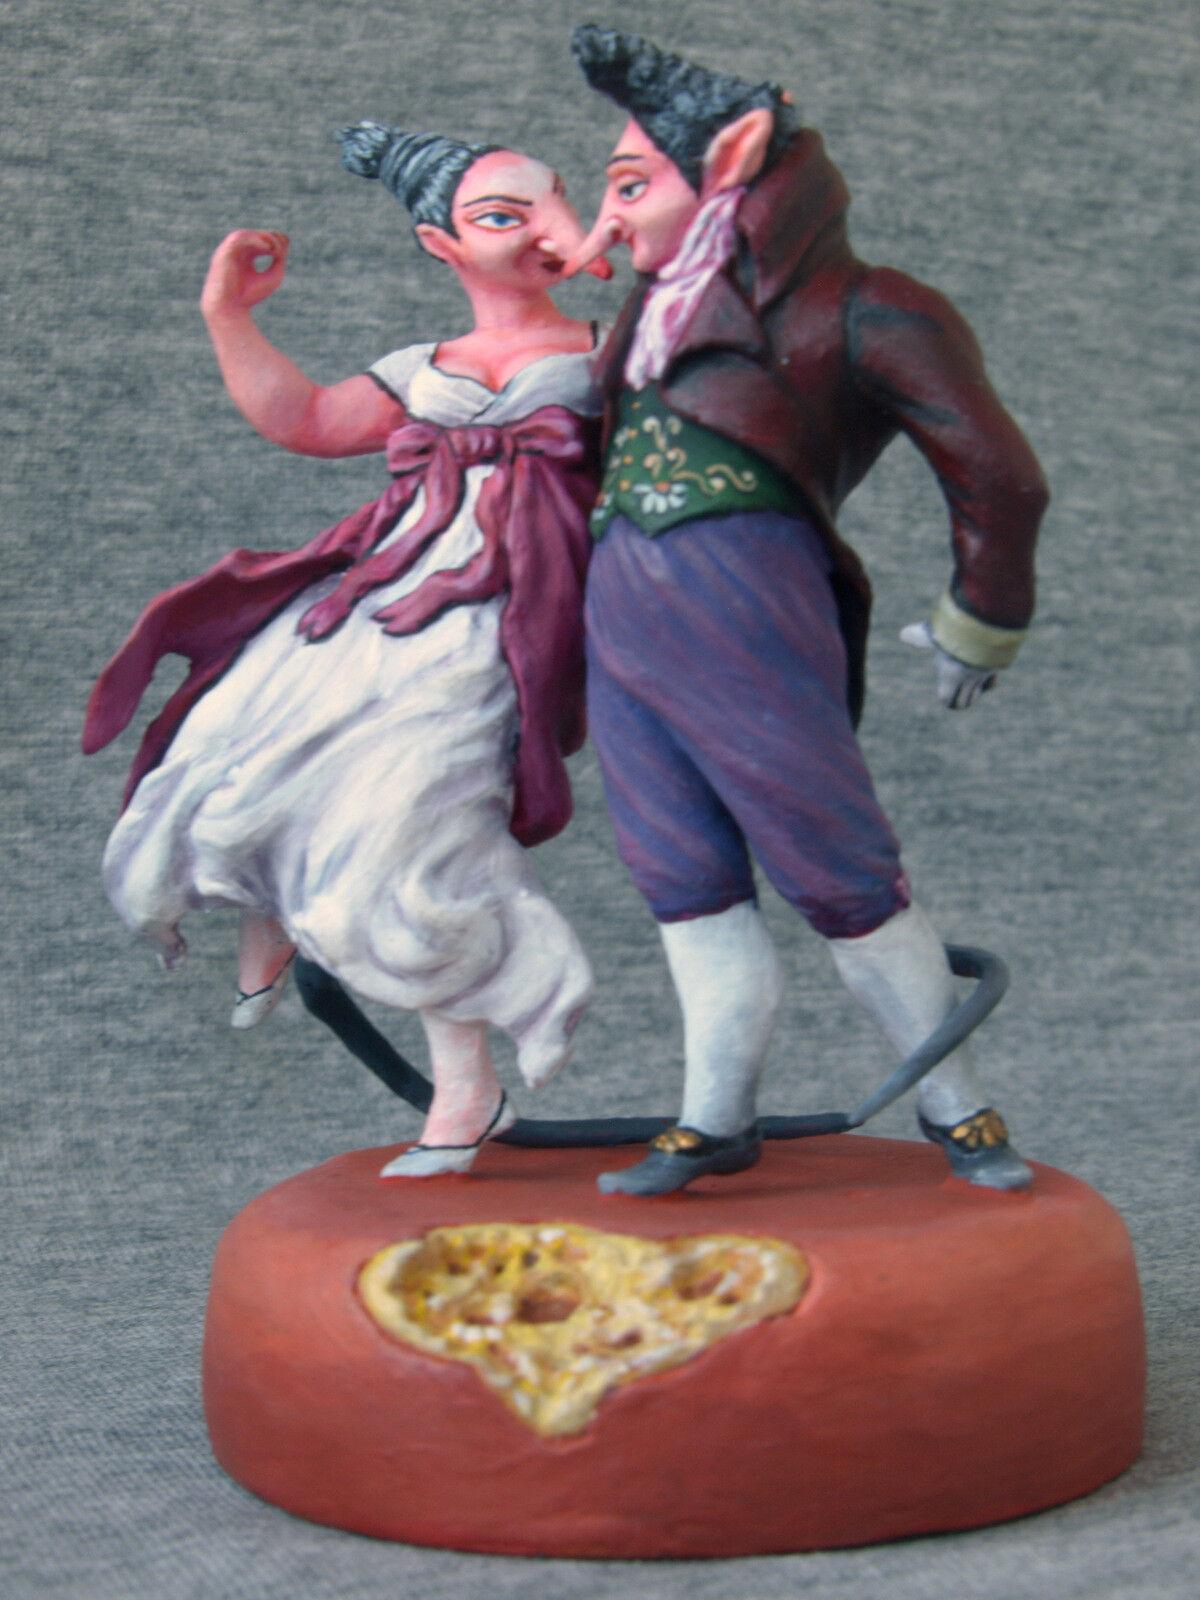 AUTOR  Mihail Chemiakin Chemiakin Chemiakin  Sculpture  Gallant rats  54 mm. Circulation  500 677e1b